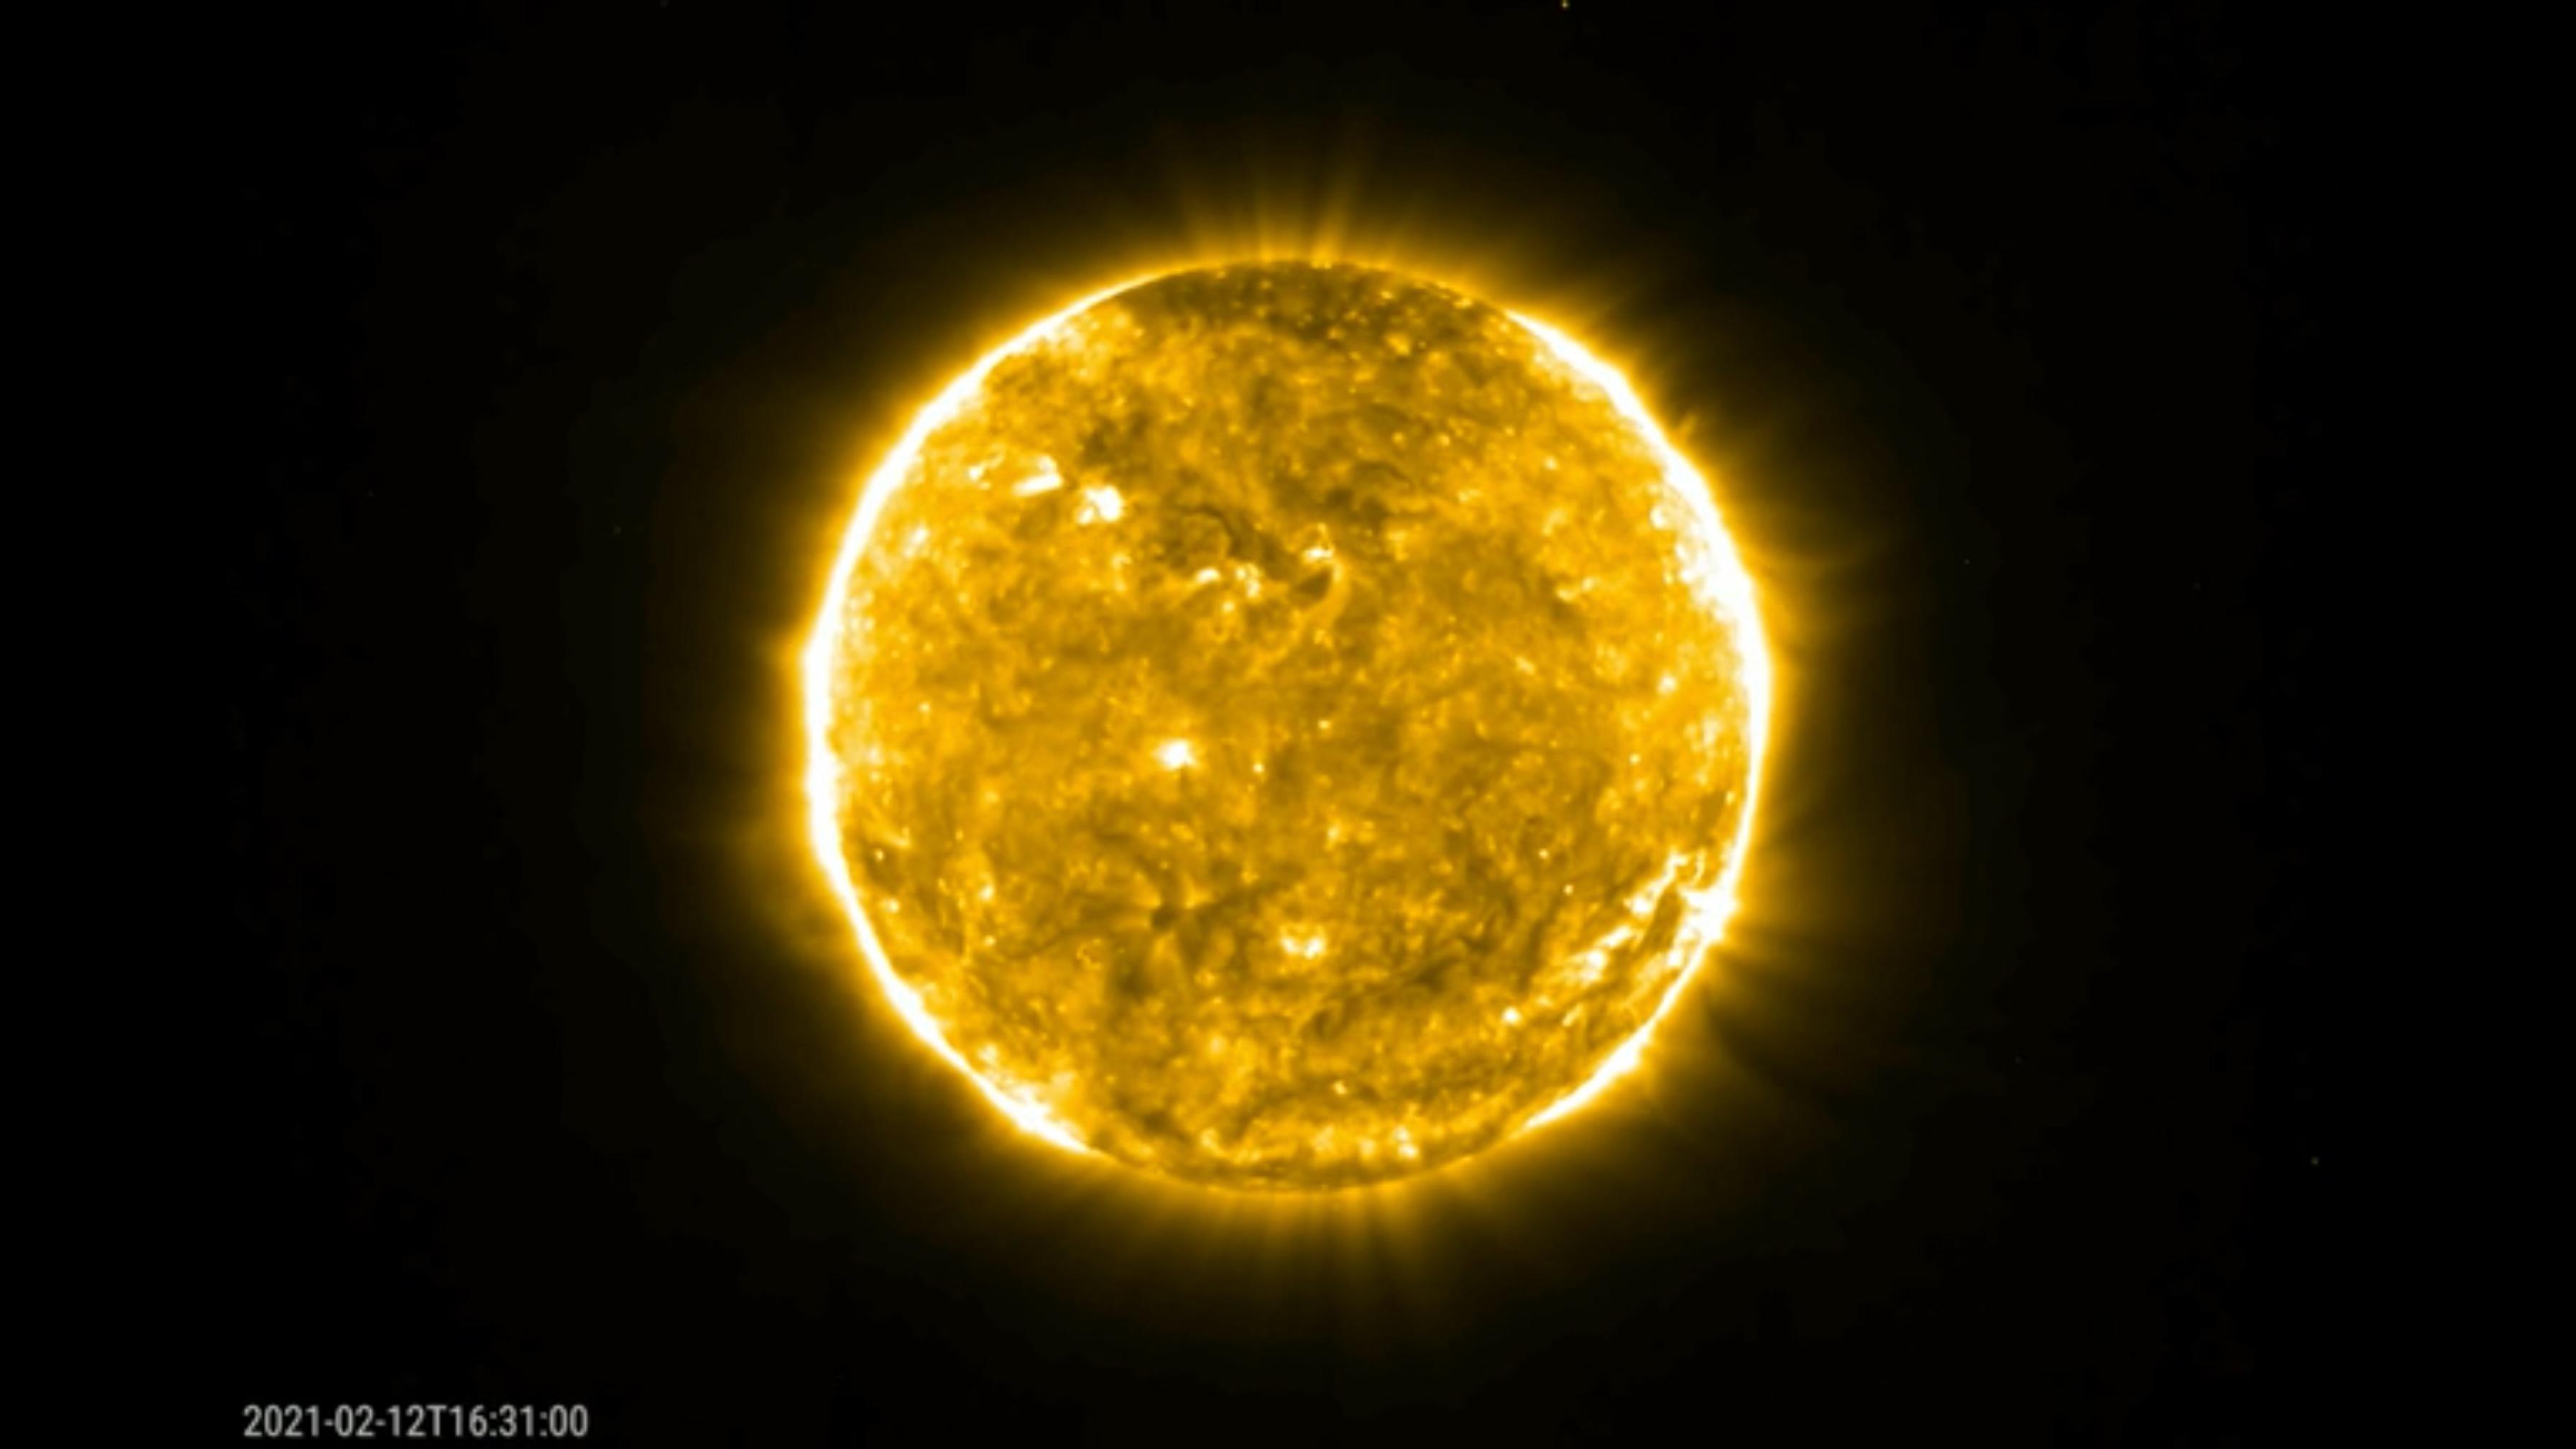 Solar Orbiter mission spots eruption from the sun